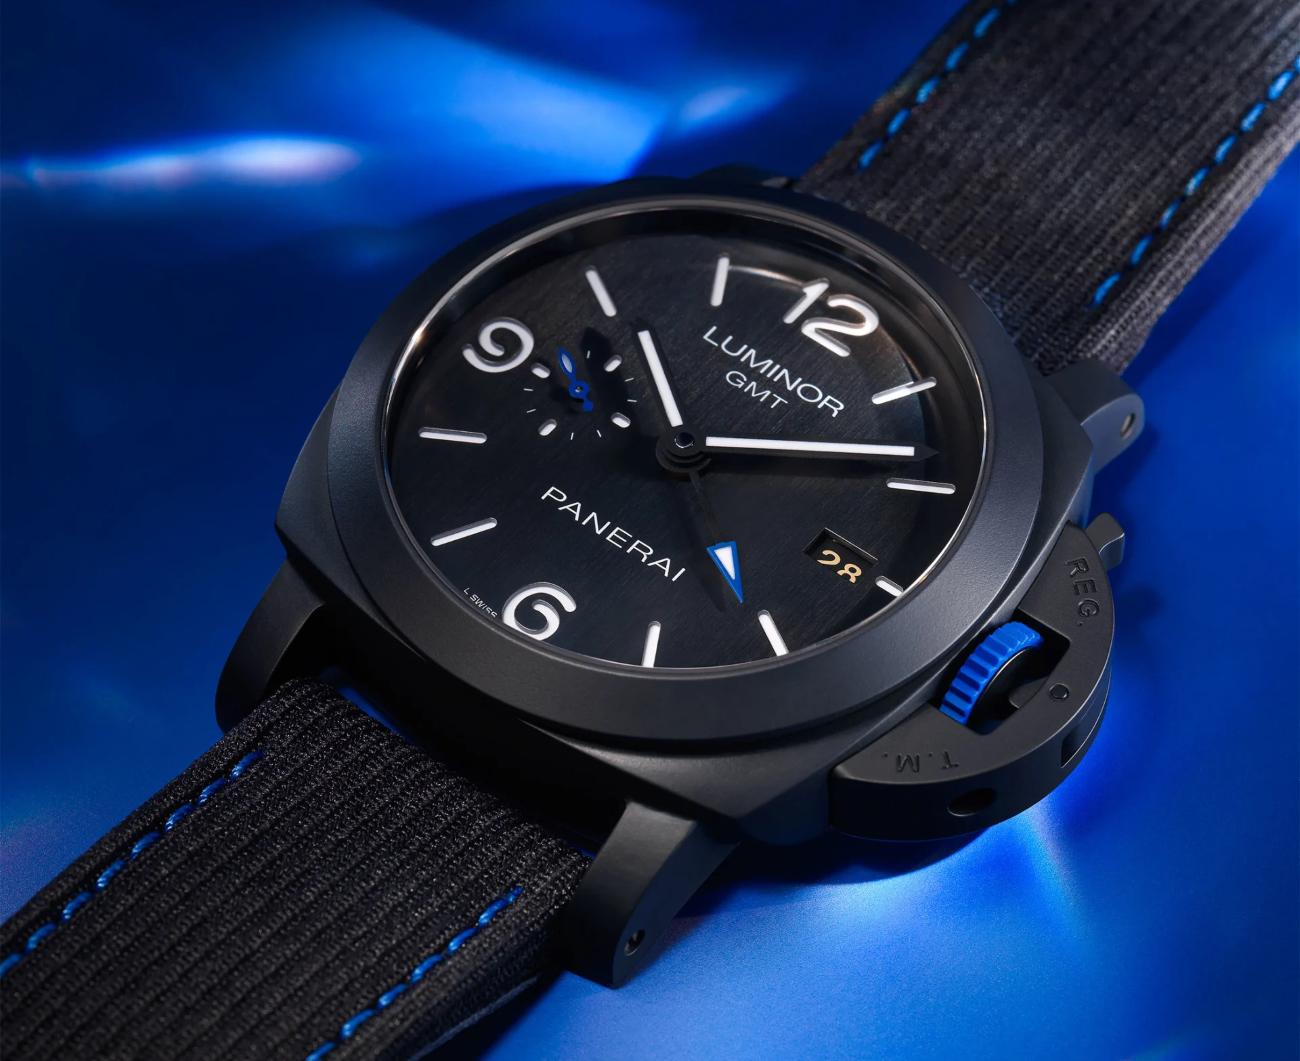 Panerai_luminor_gmt_Bucherer_blue_3-_Europa_Star_watch_magazine_2020